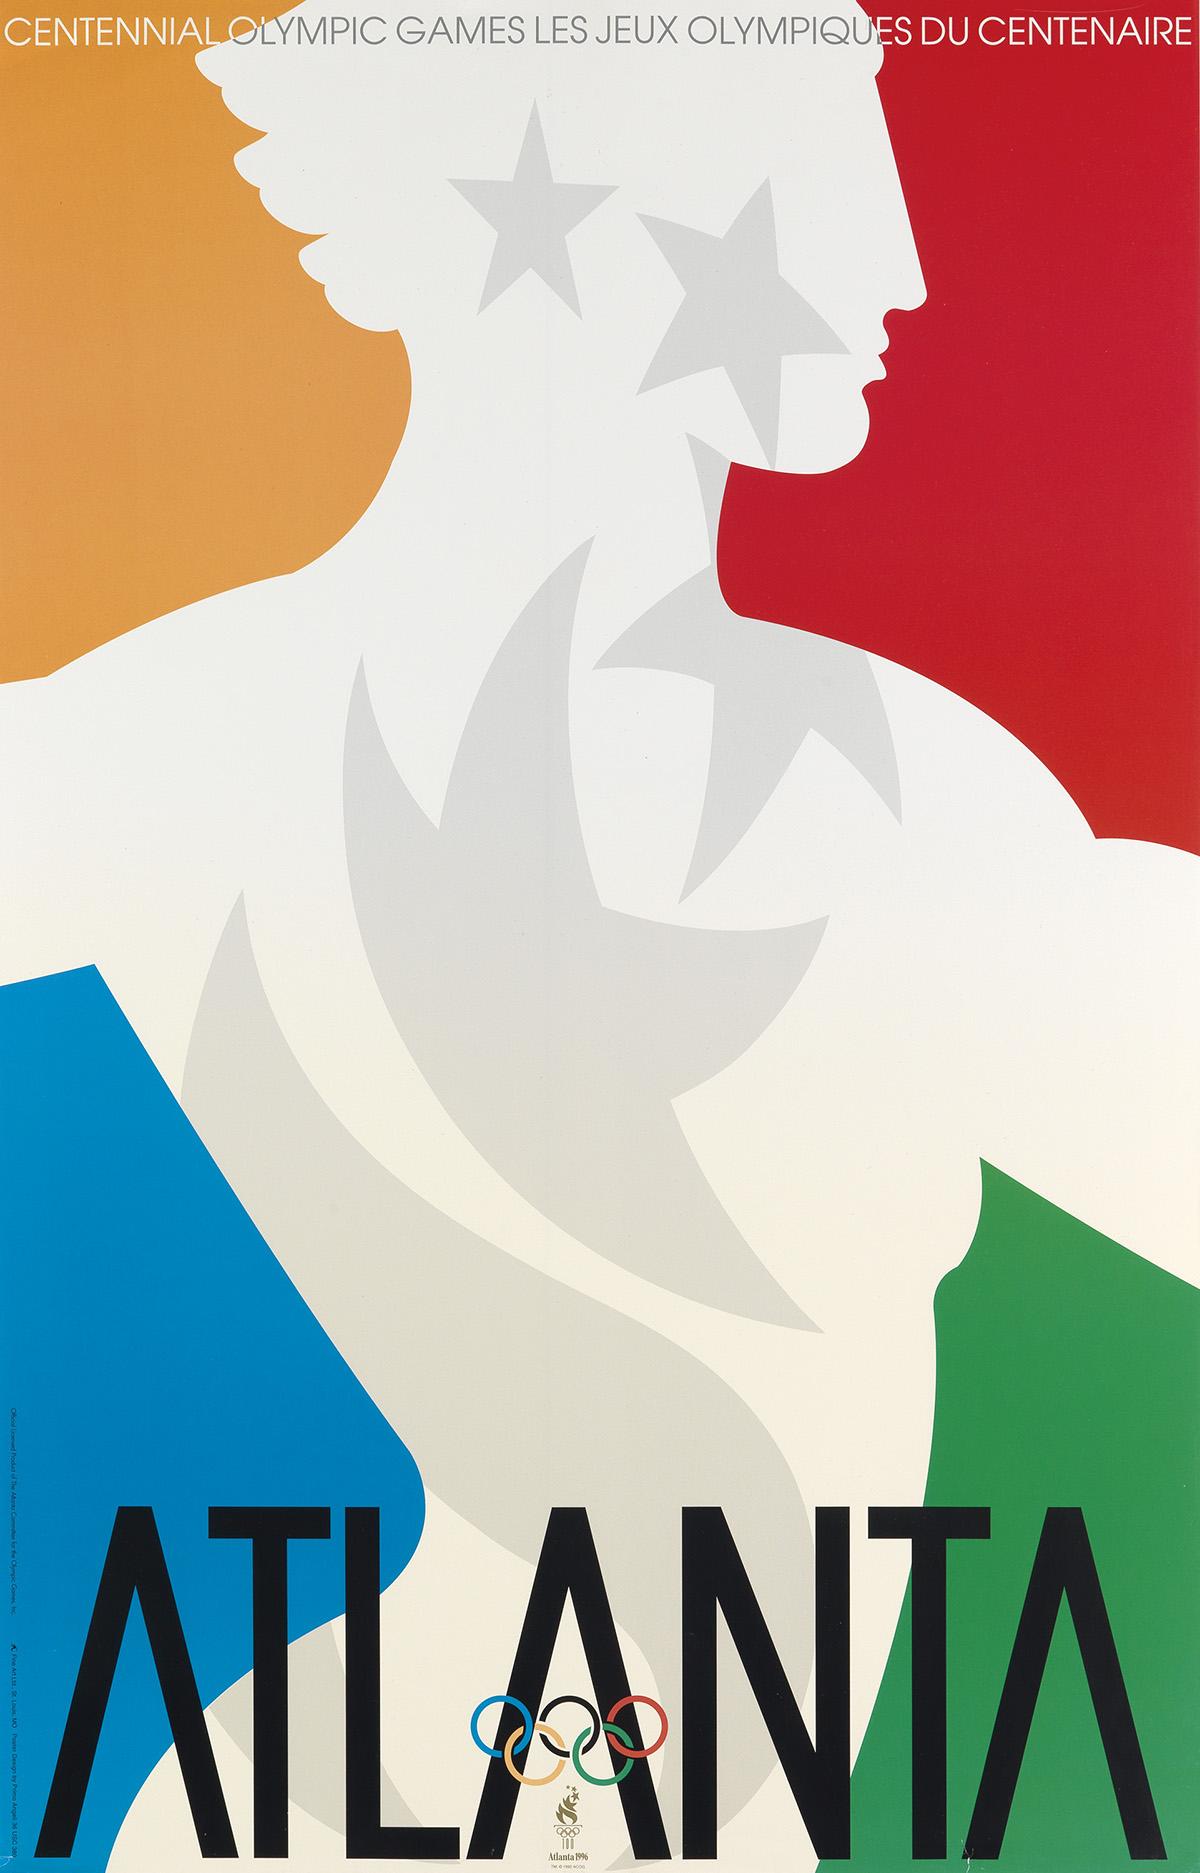 PRIMO-ANGELI-(1931-2003)-ATLANTA-OLYMPICS-1996-34x22-inches-